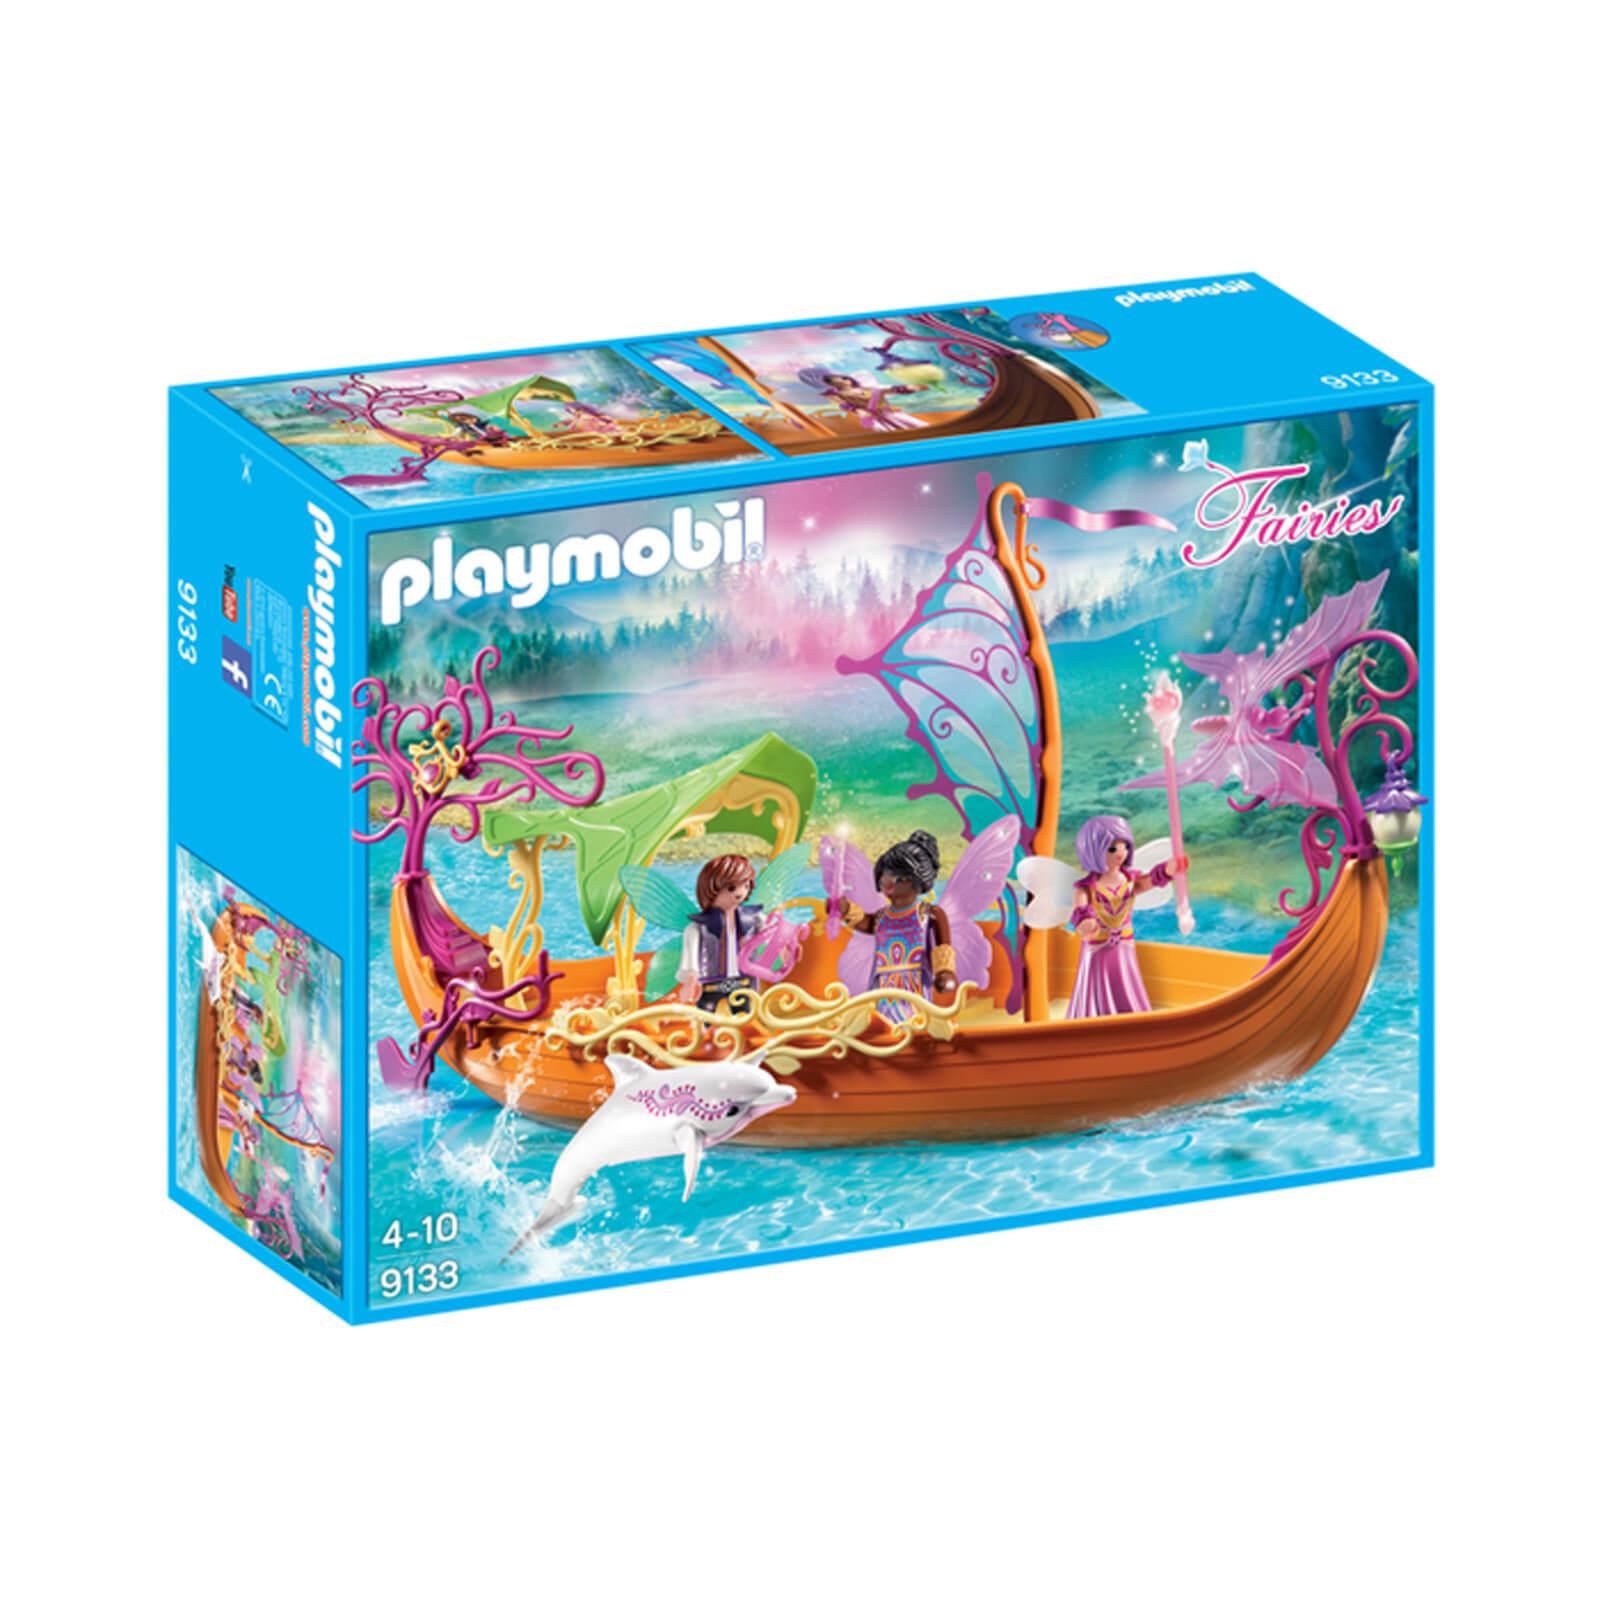 Playmobil Floating Enchanted Fairy Ship (9133)